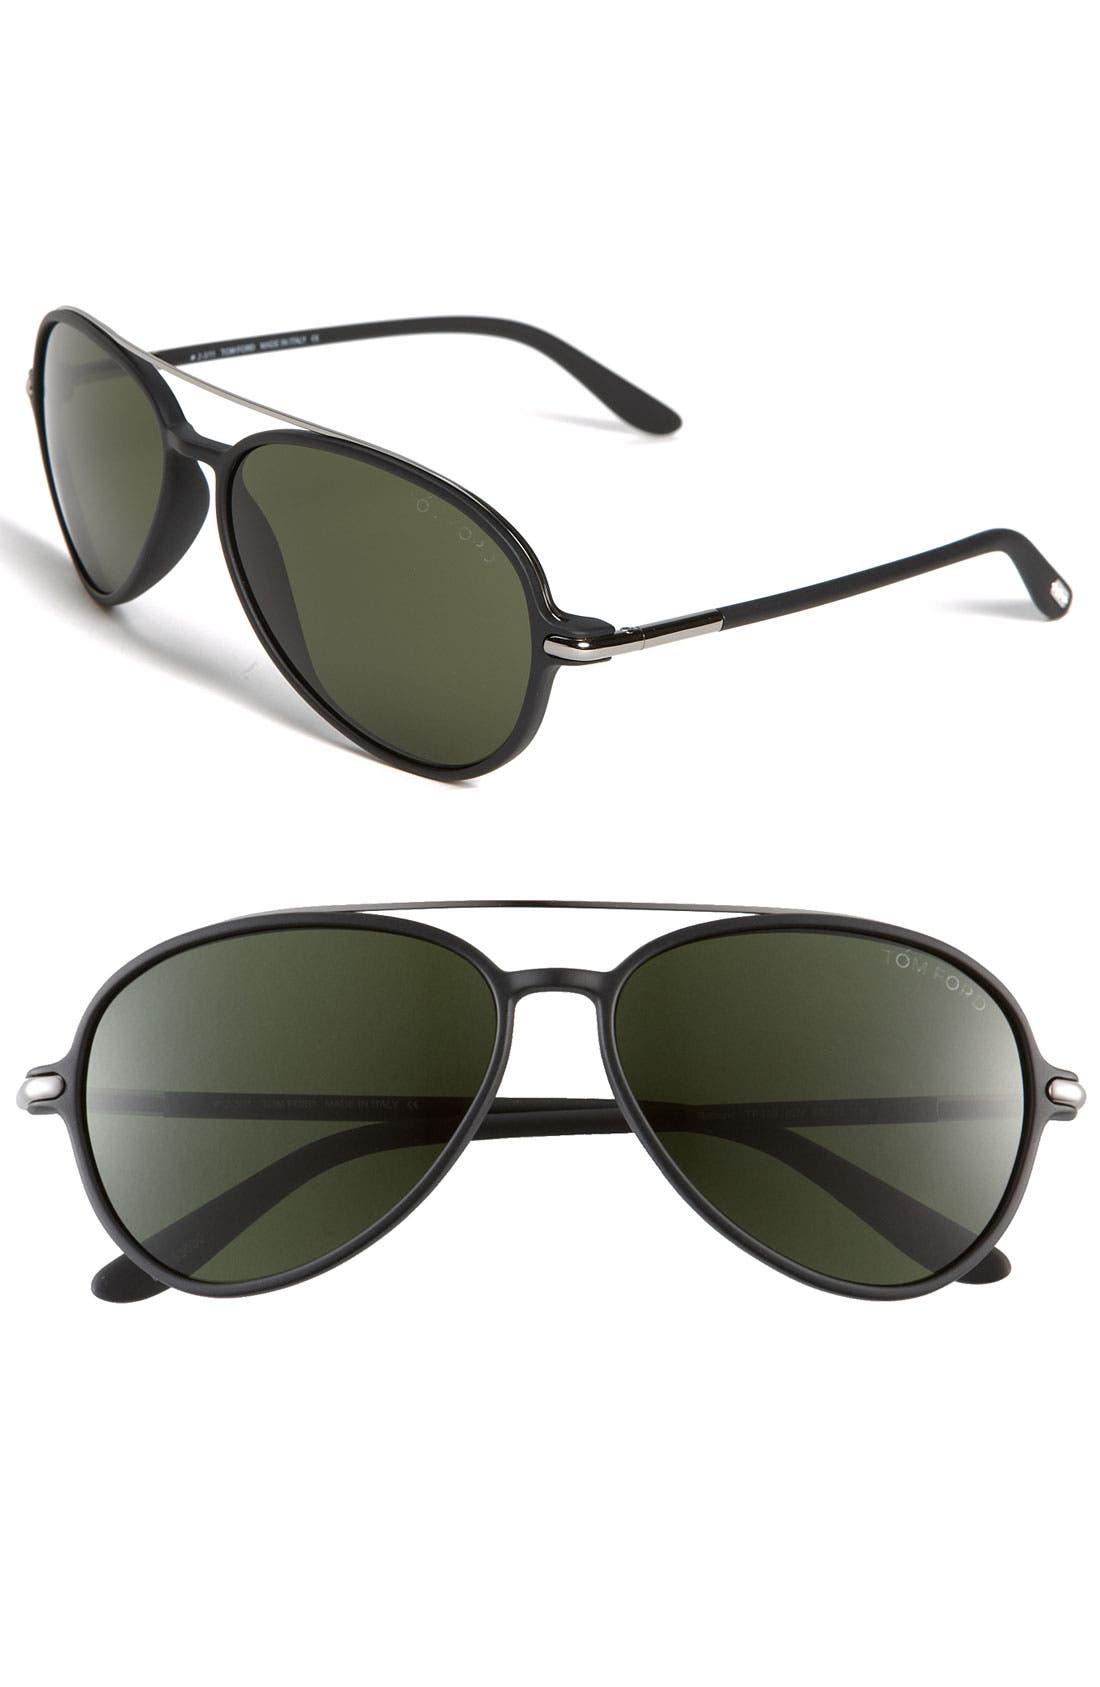 Alternate Image 1 Selected - Tom Ford 'Ramone' 58mm Aviator Sunglasses